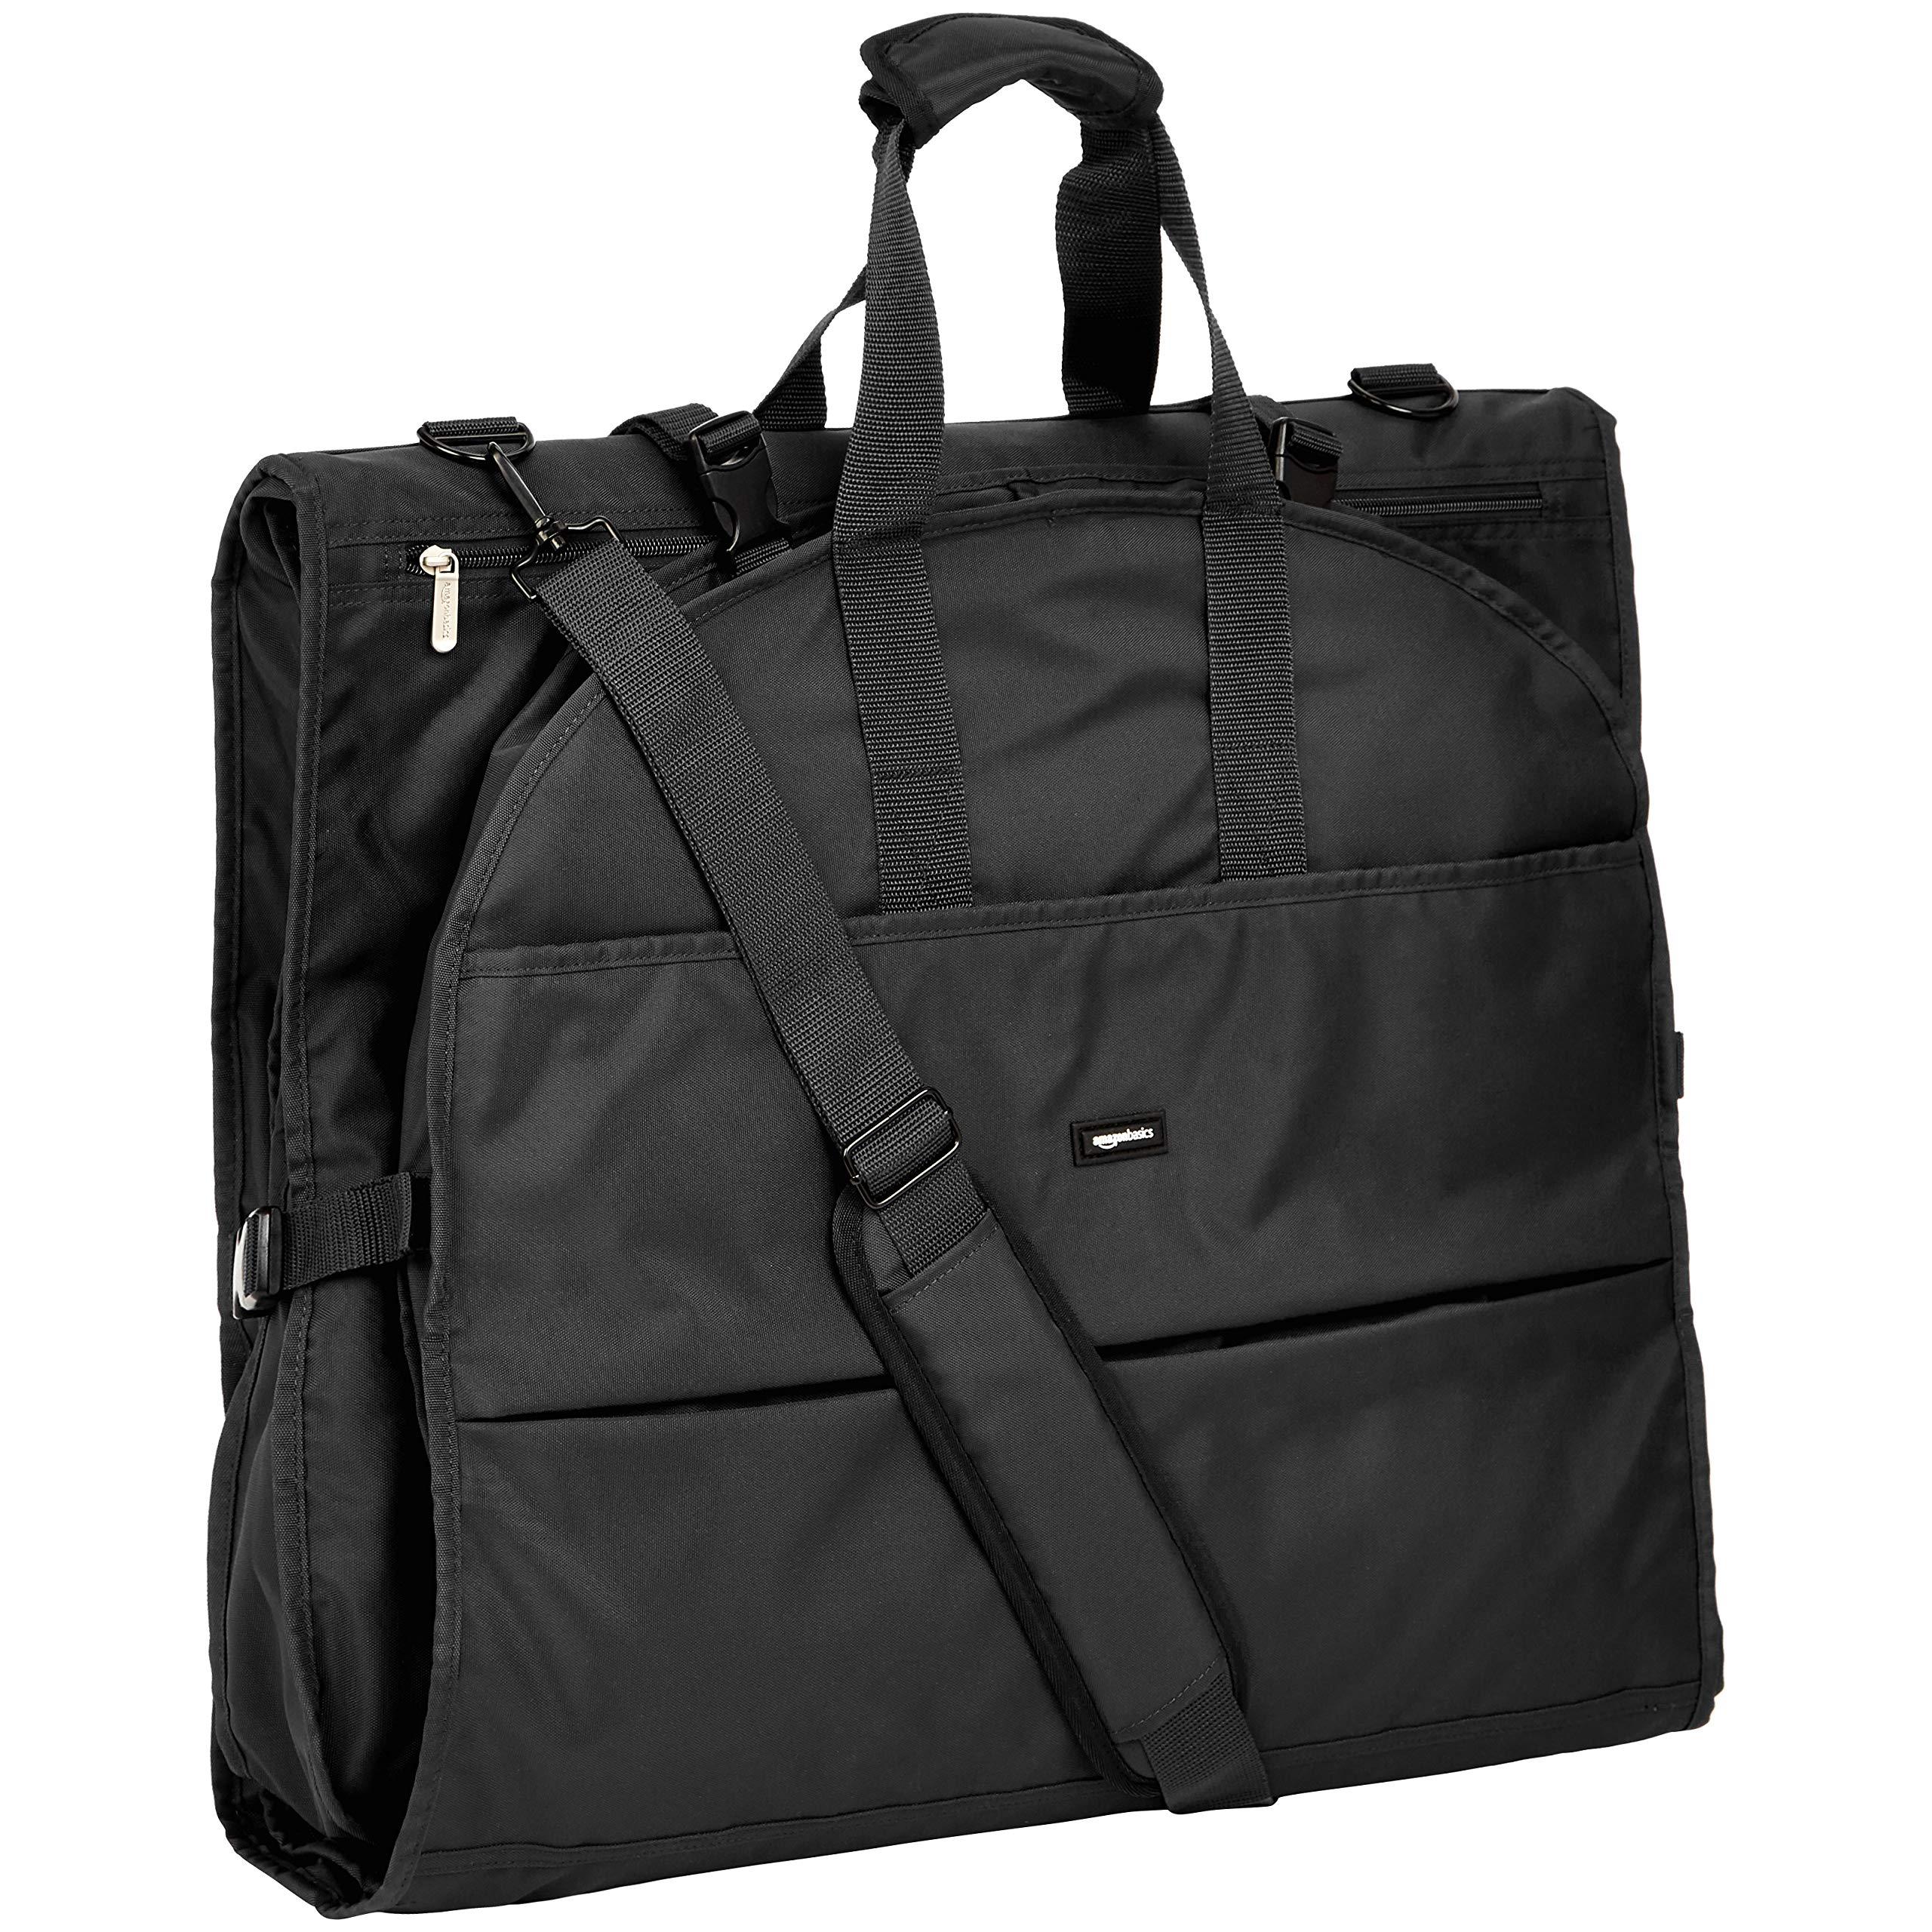 Amazon Basics Premium Tri-Fold Travel Hanging Garment Bag - 23.5 Inch, Black